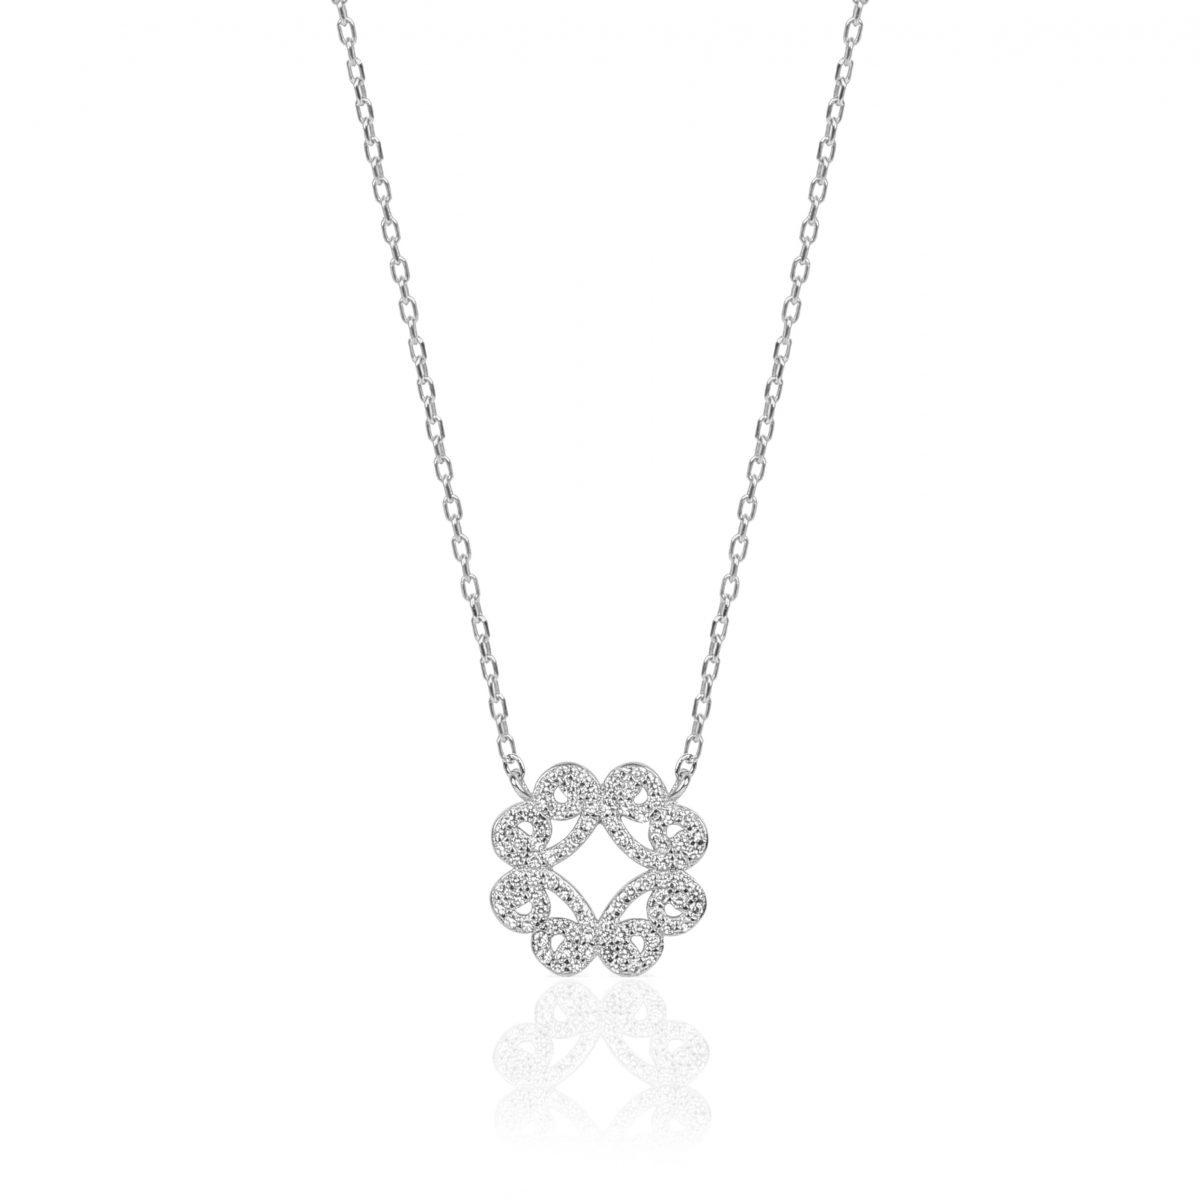 Naila Silver Necklace Blyte Silver Necklace - High Street Jewelry